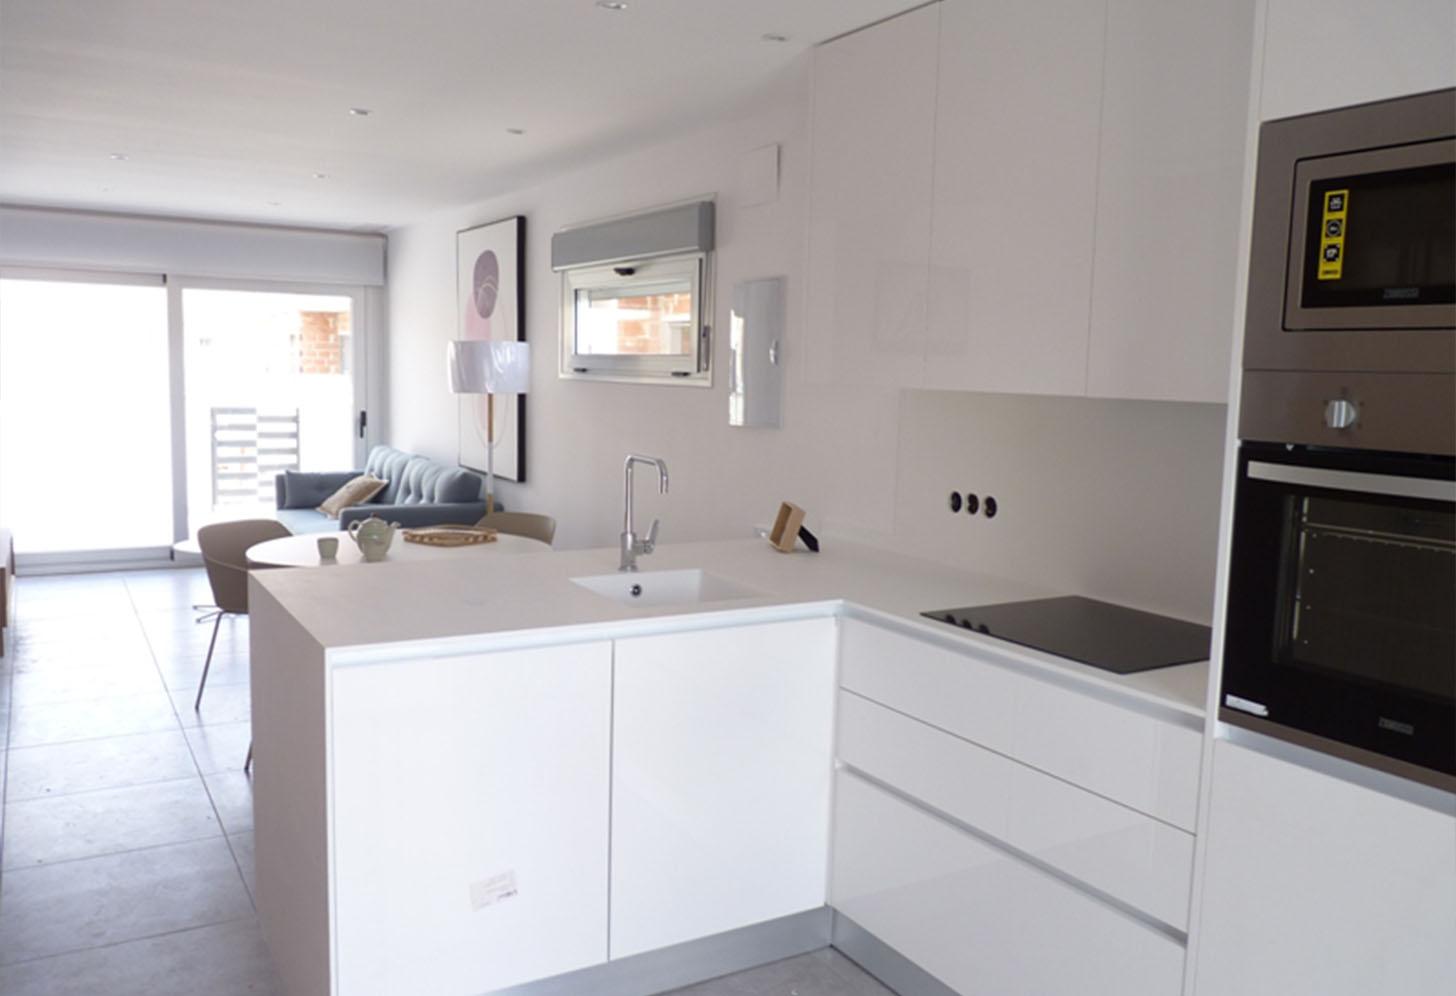 immobilier neuf espagne costa blanca on-n1 azucena del mar cuisine